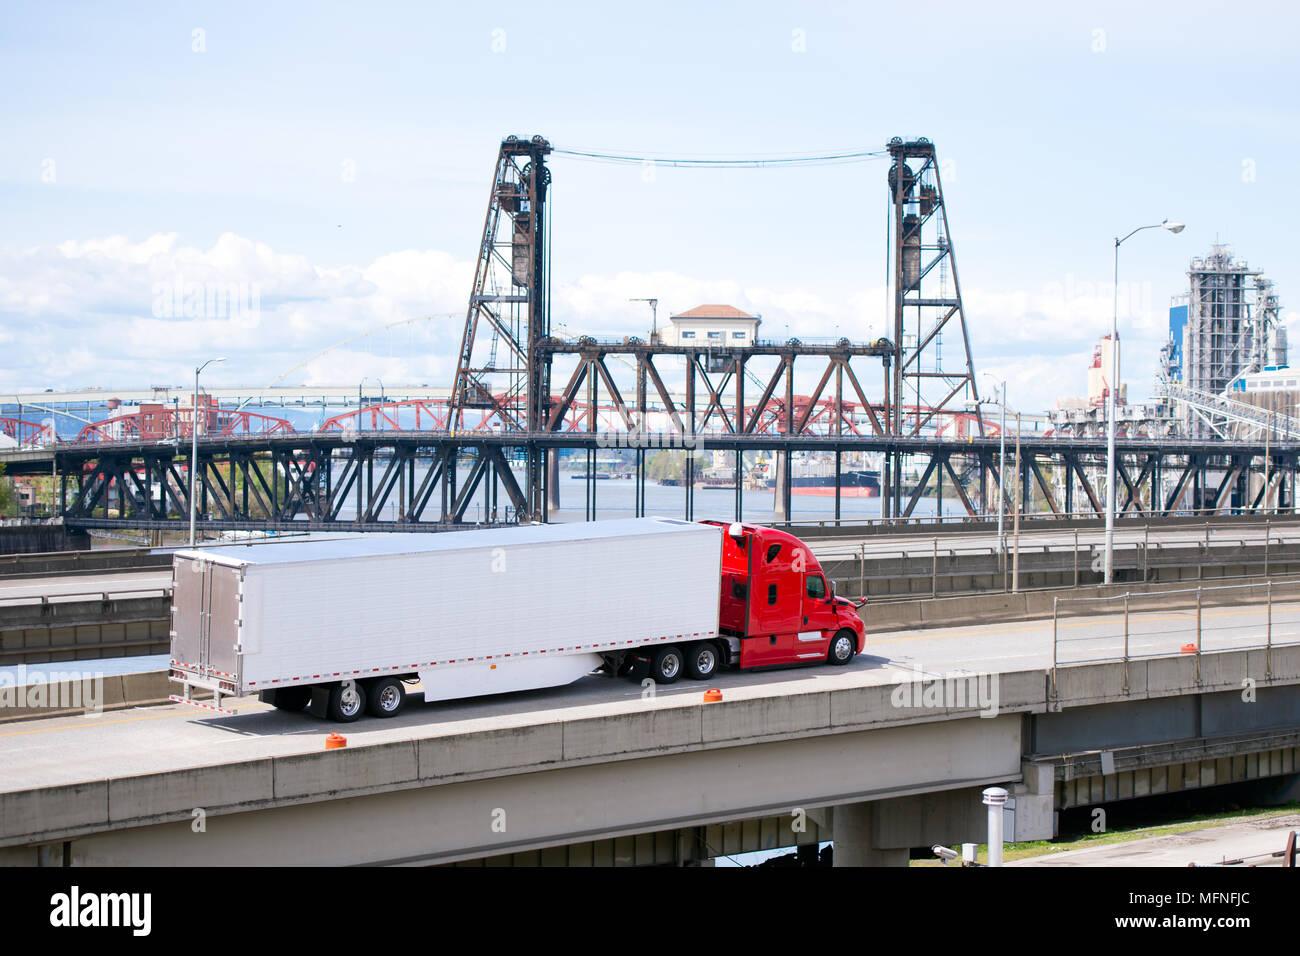 Big rig bright red semi truck transporting semi trailer with